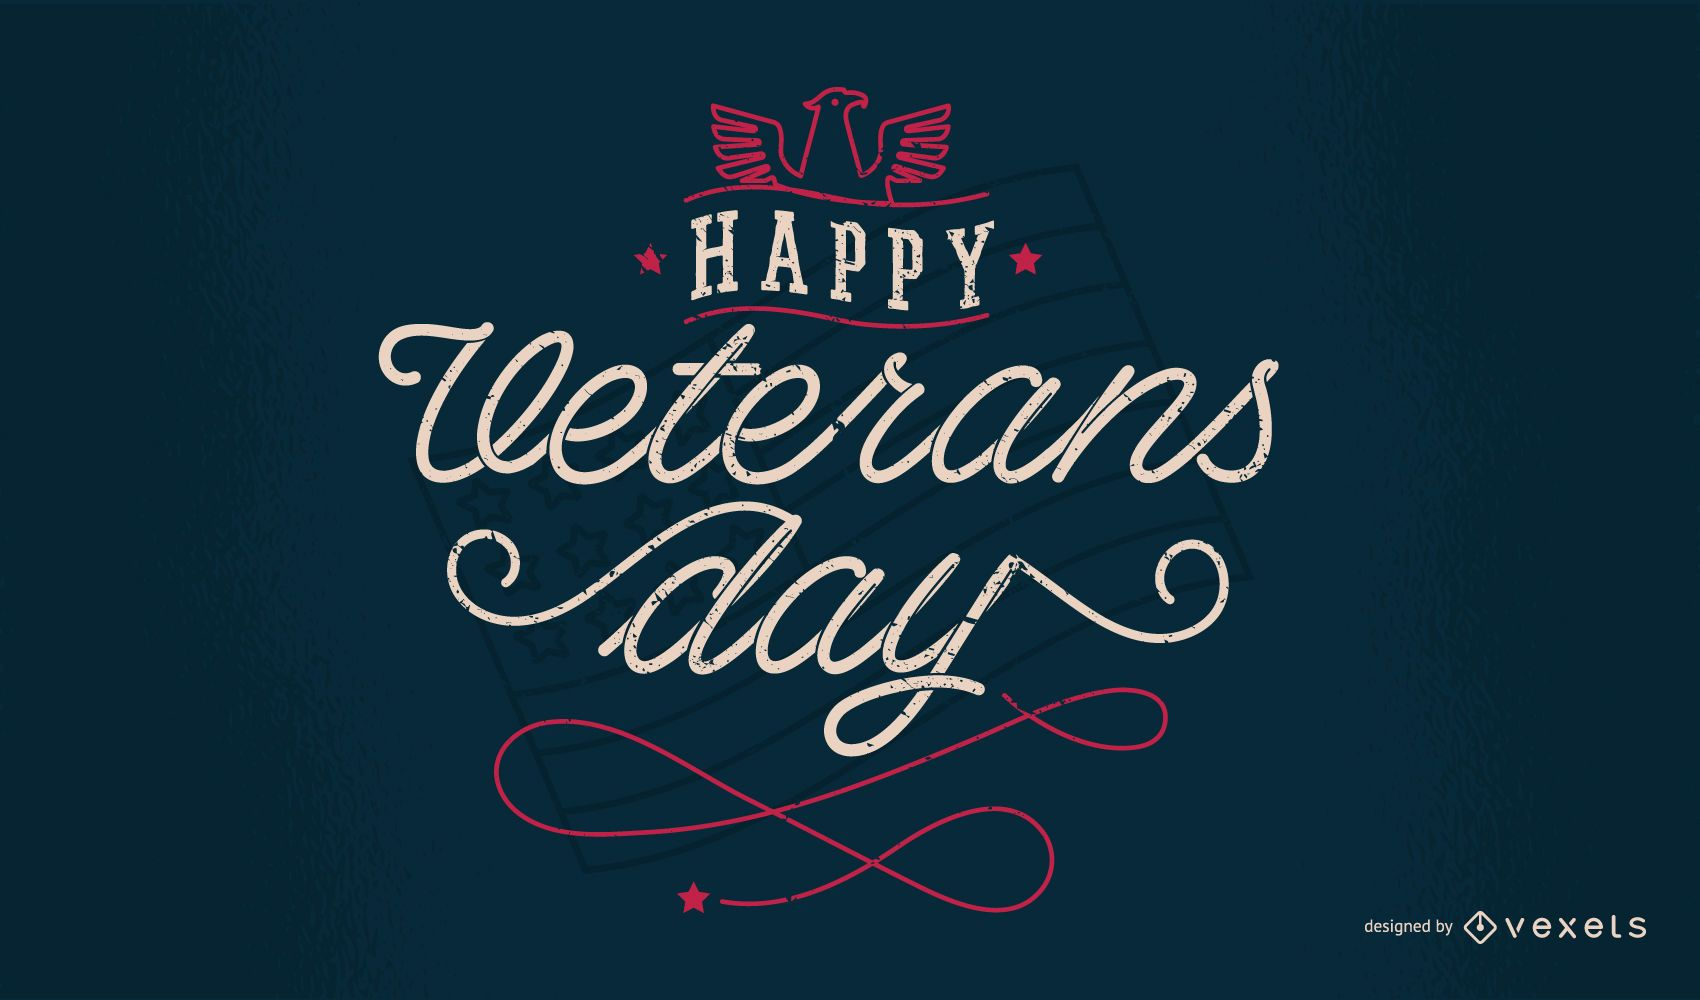 Happy Veterans Day Lettering Design